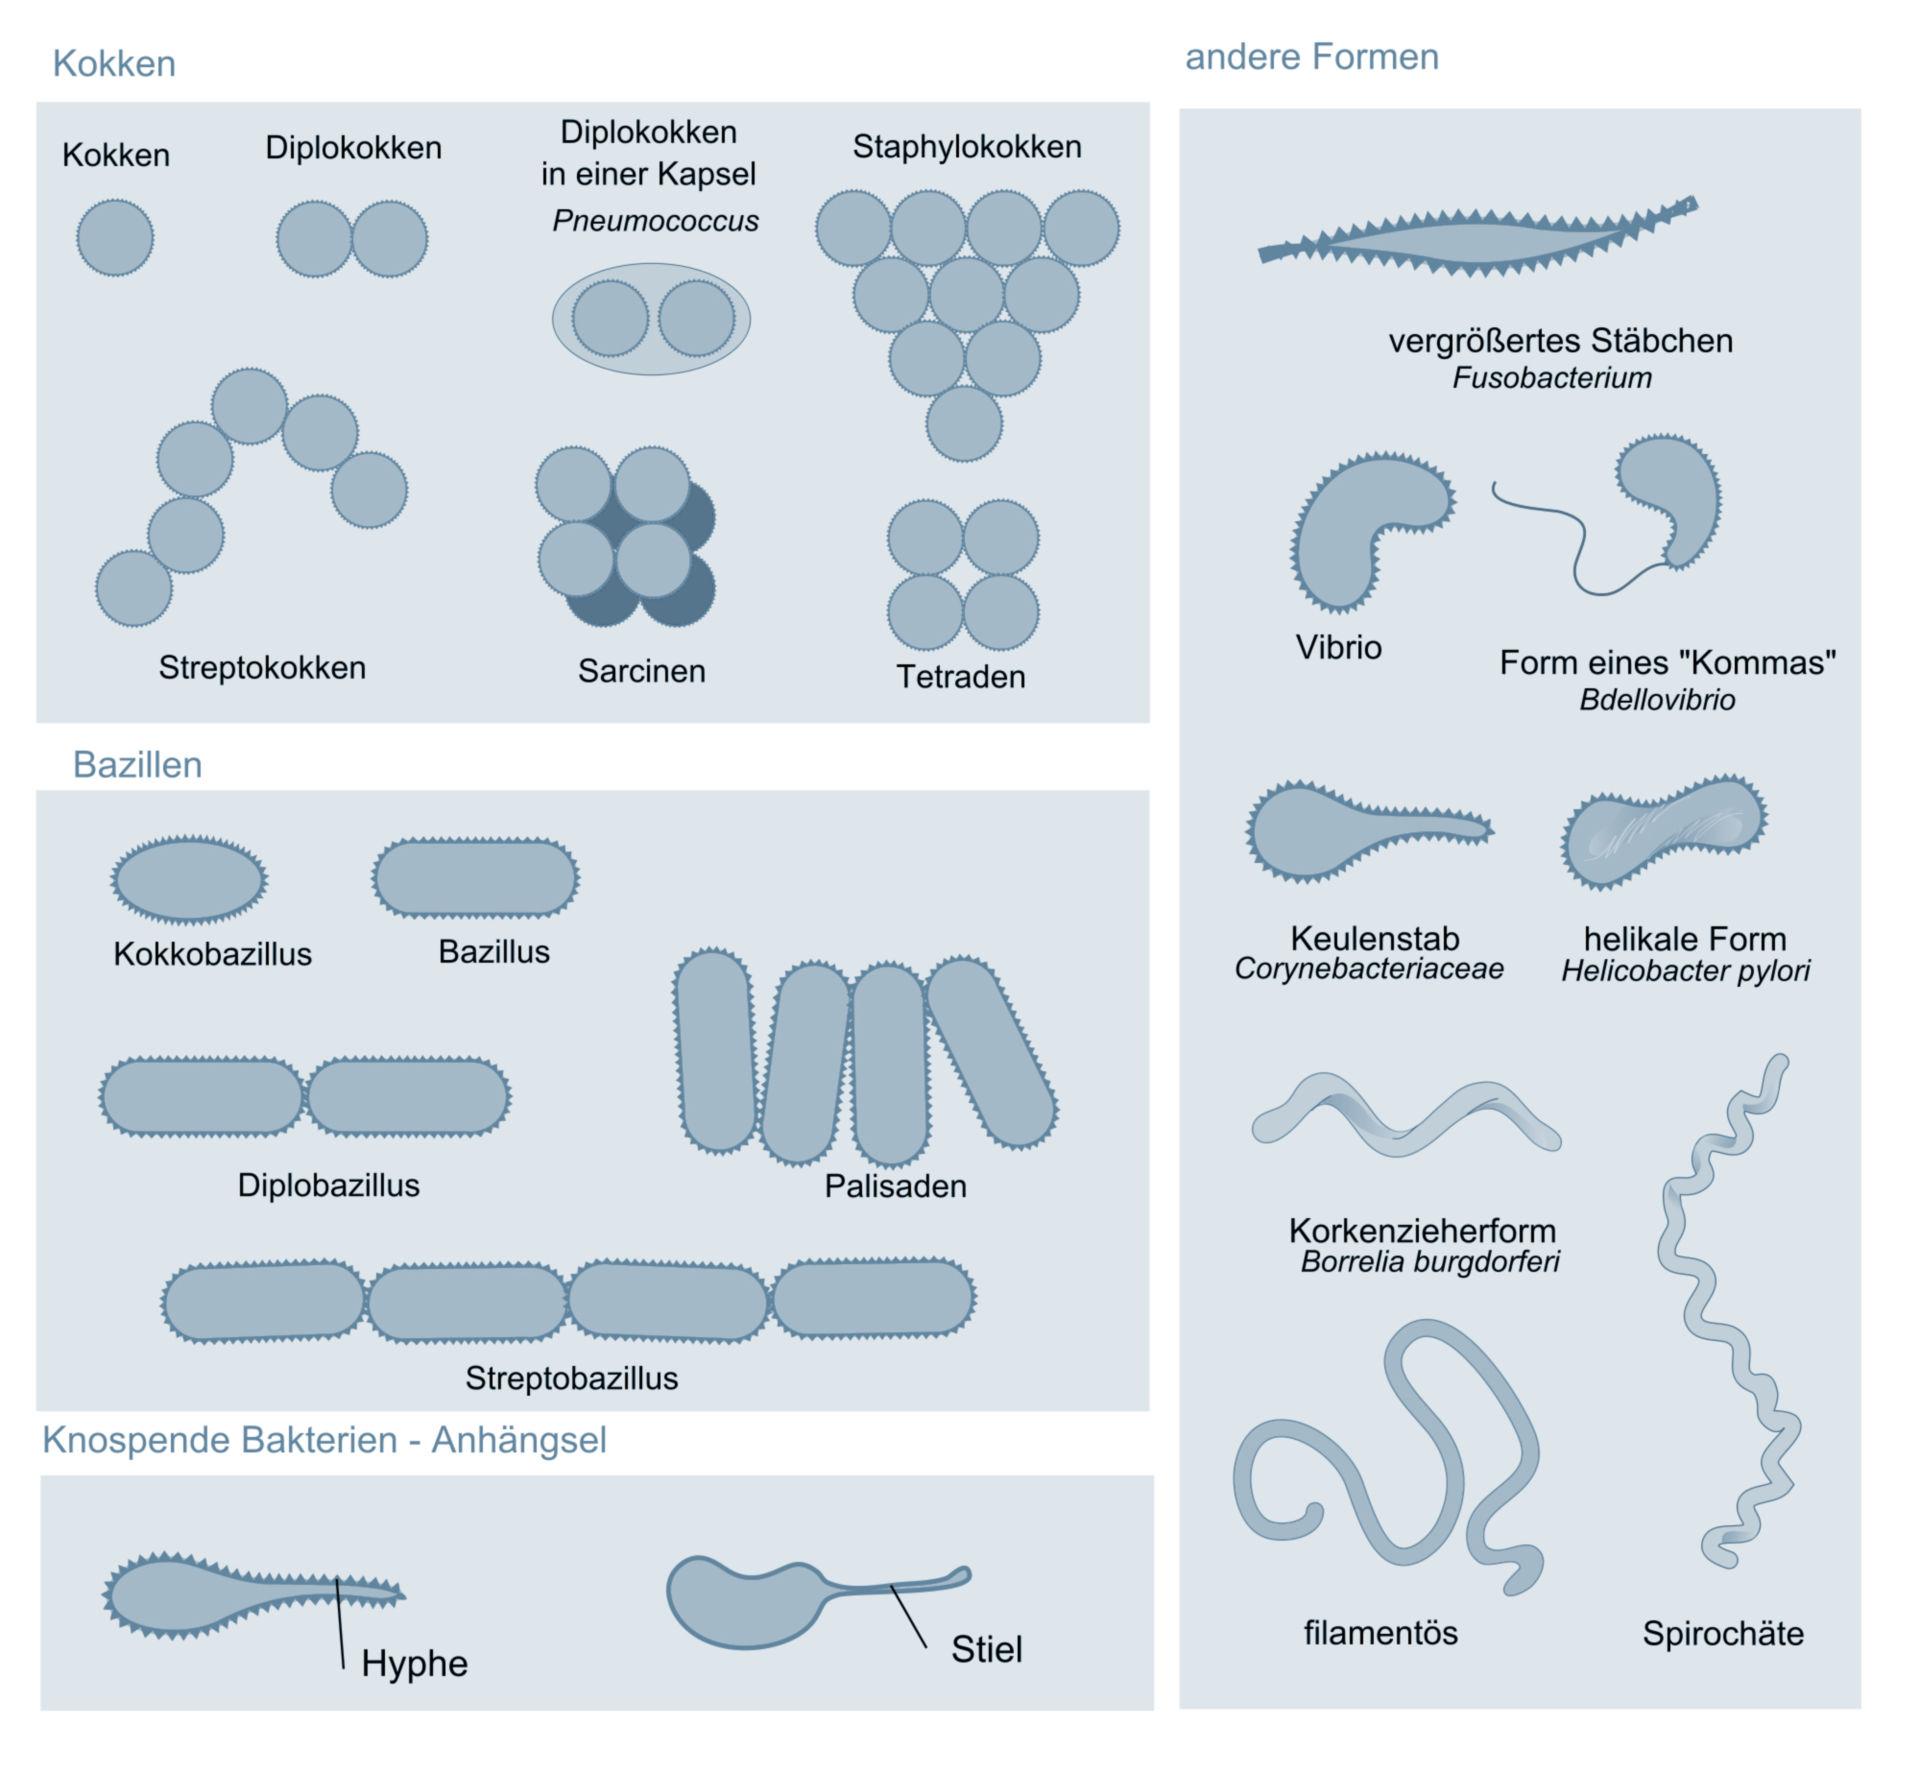 Morphology of various bacteria